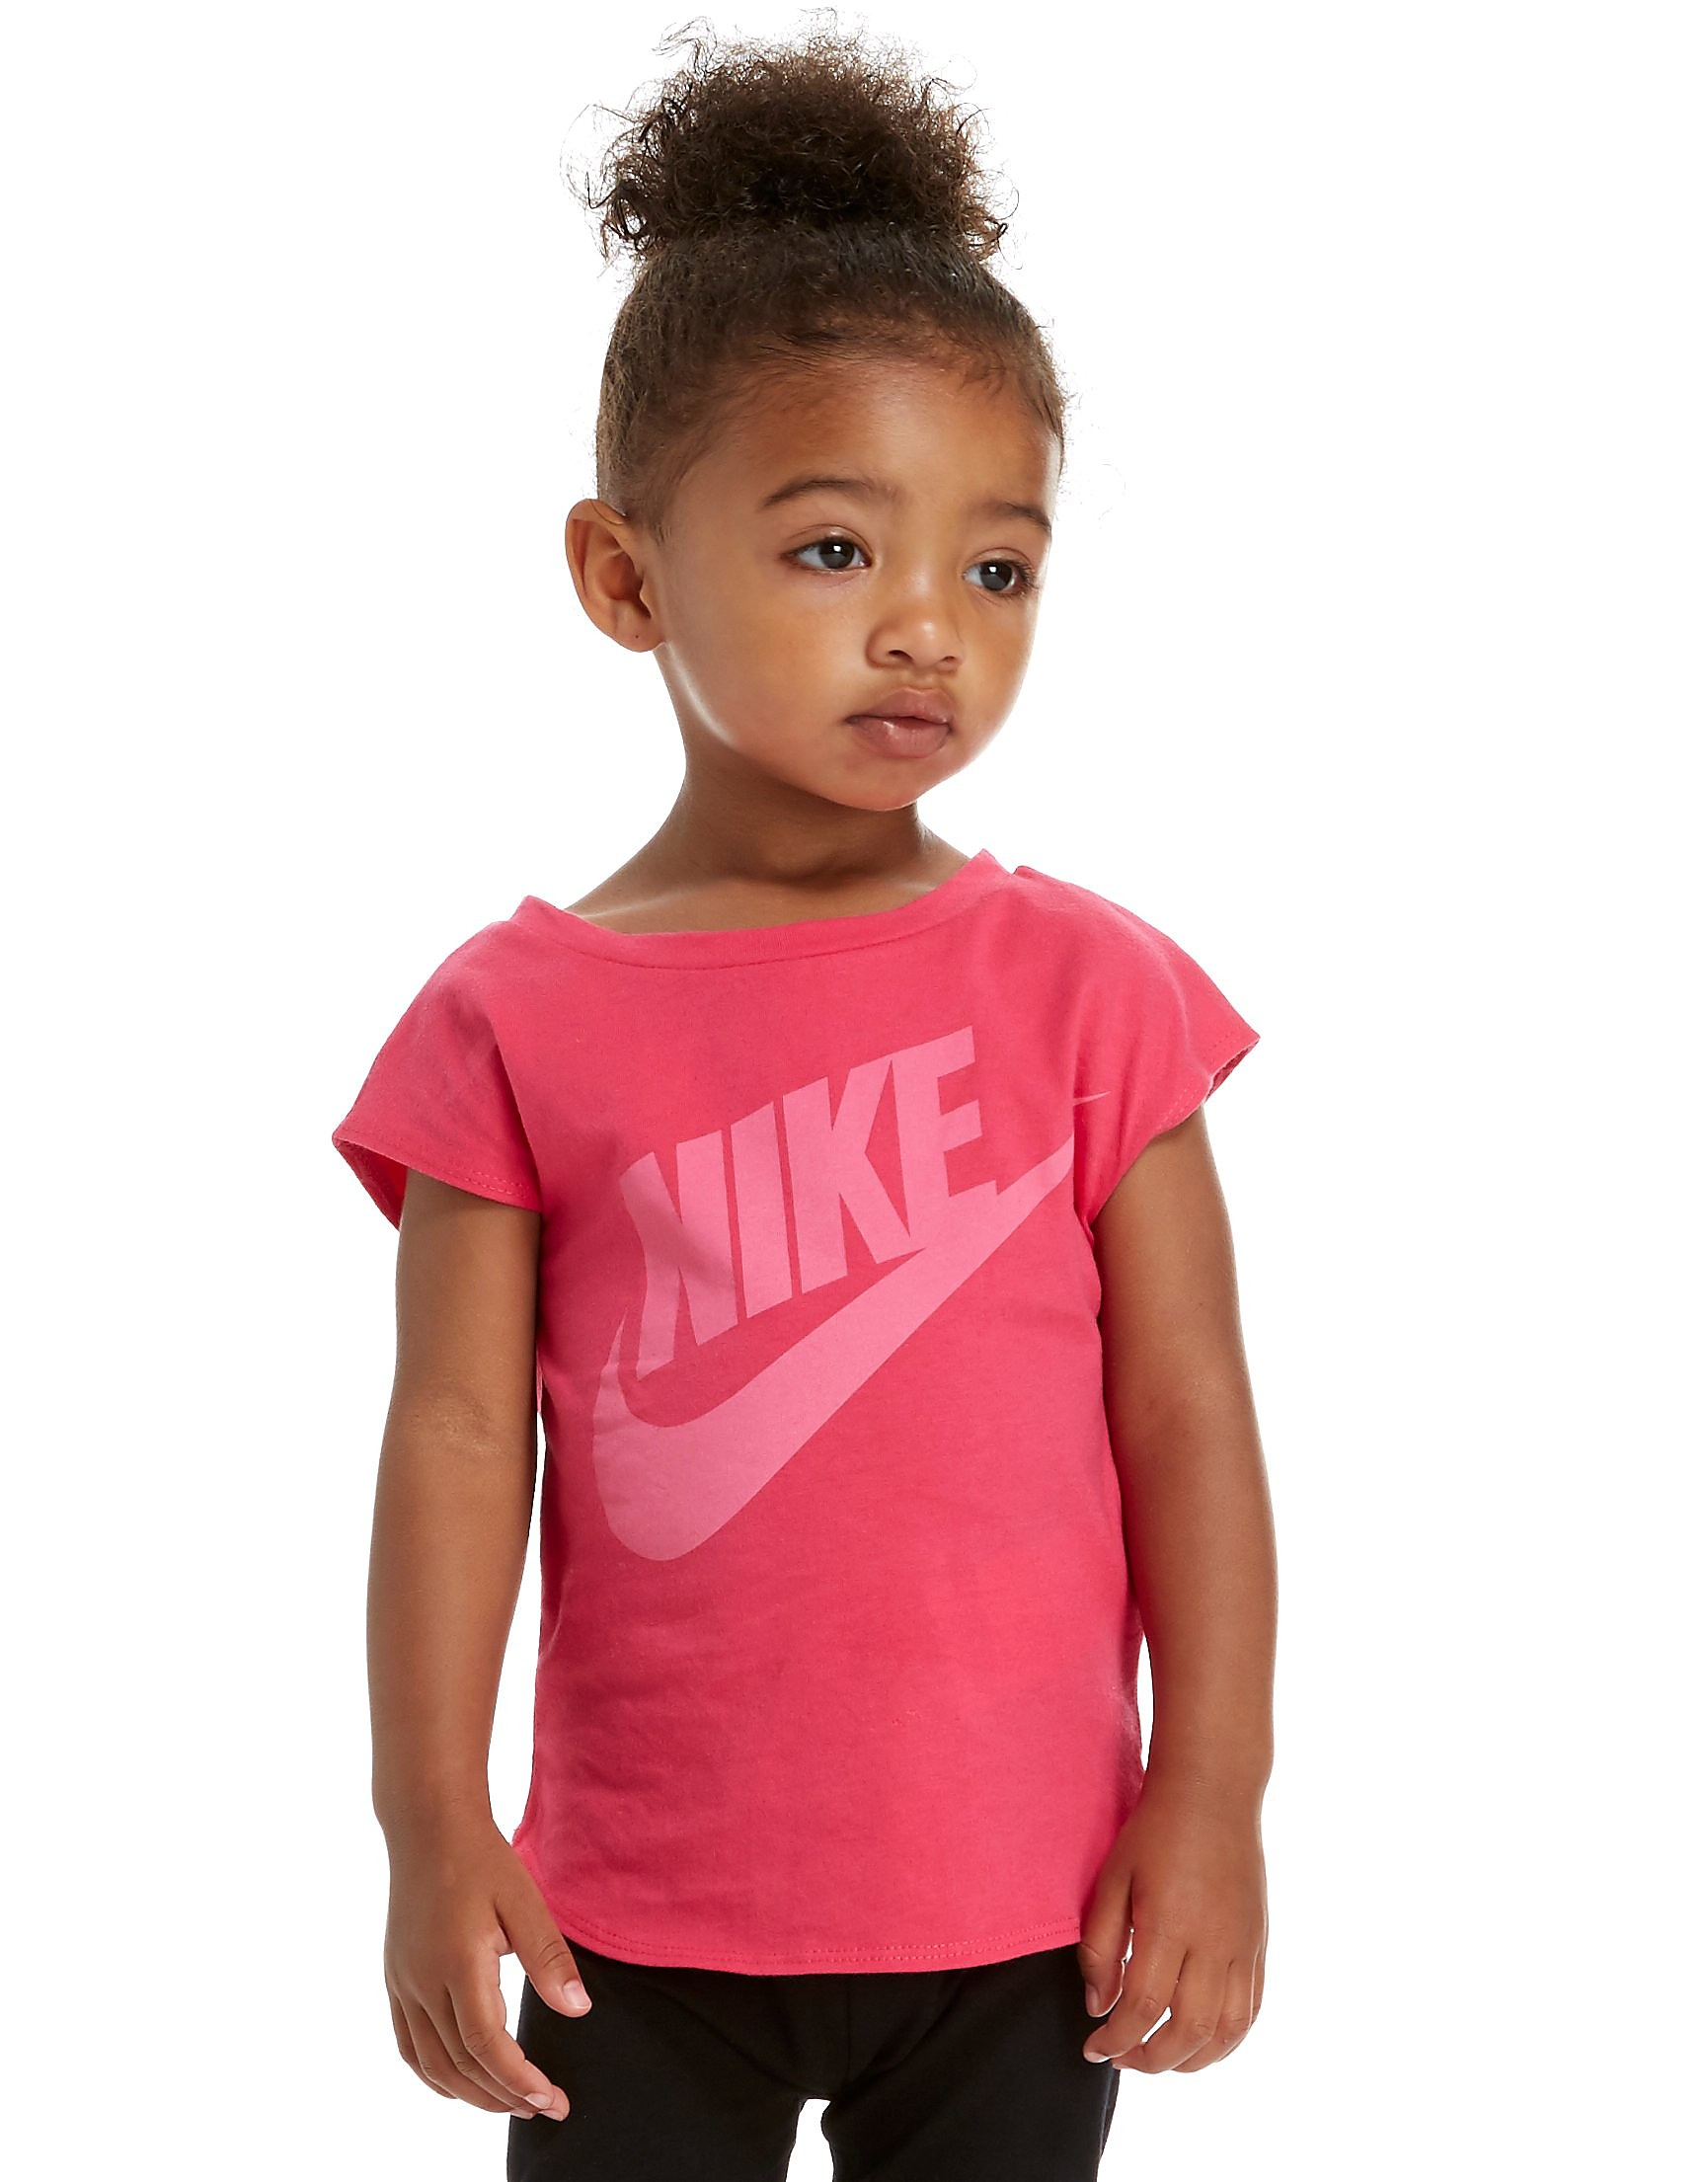 Nike Girls' Futura T-Shirt Infant